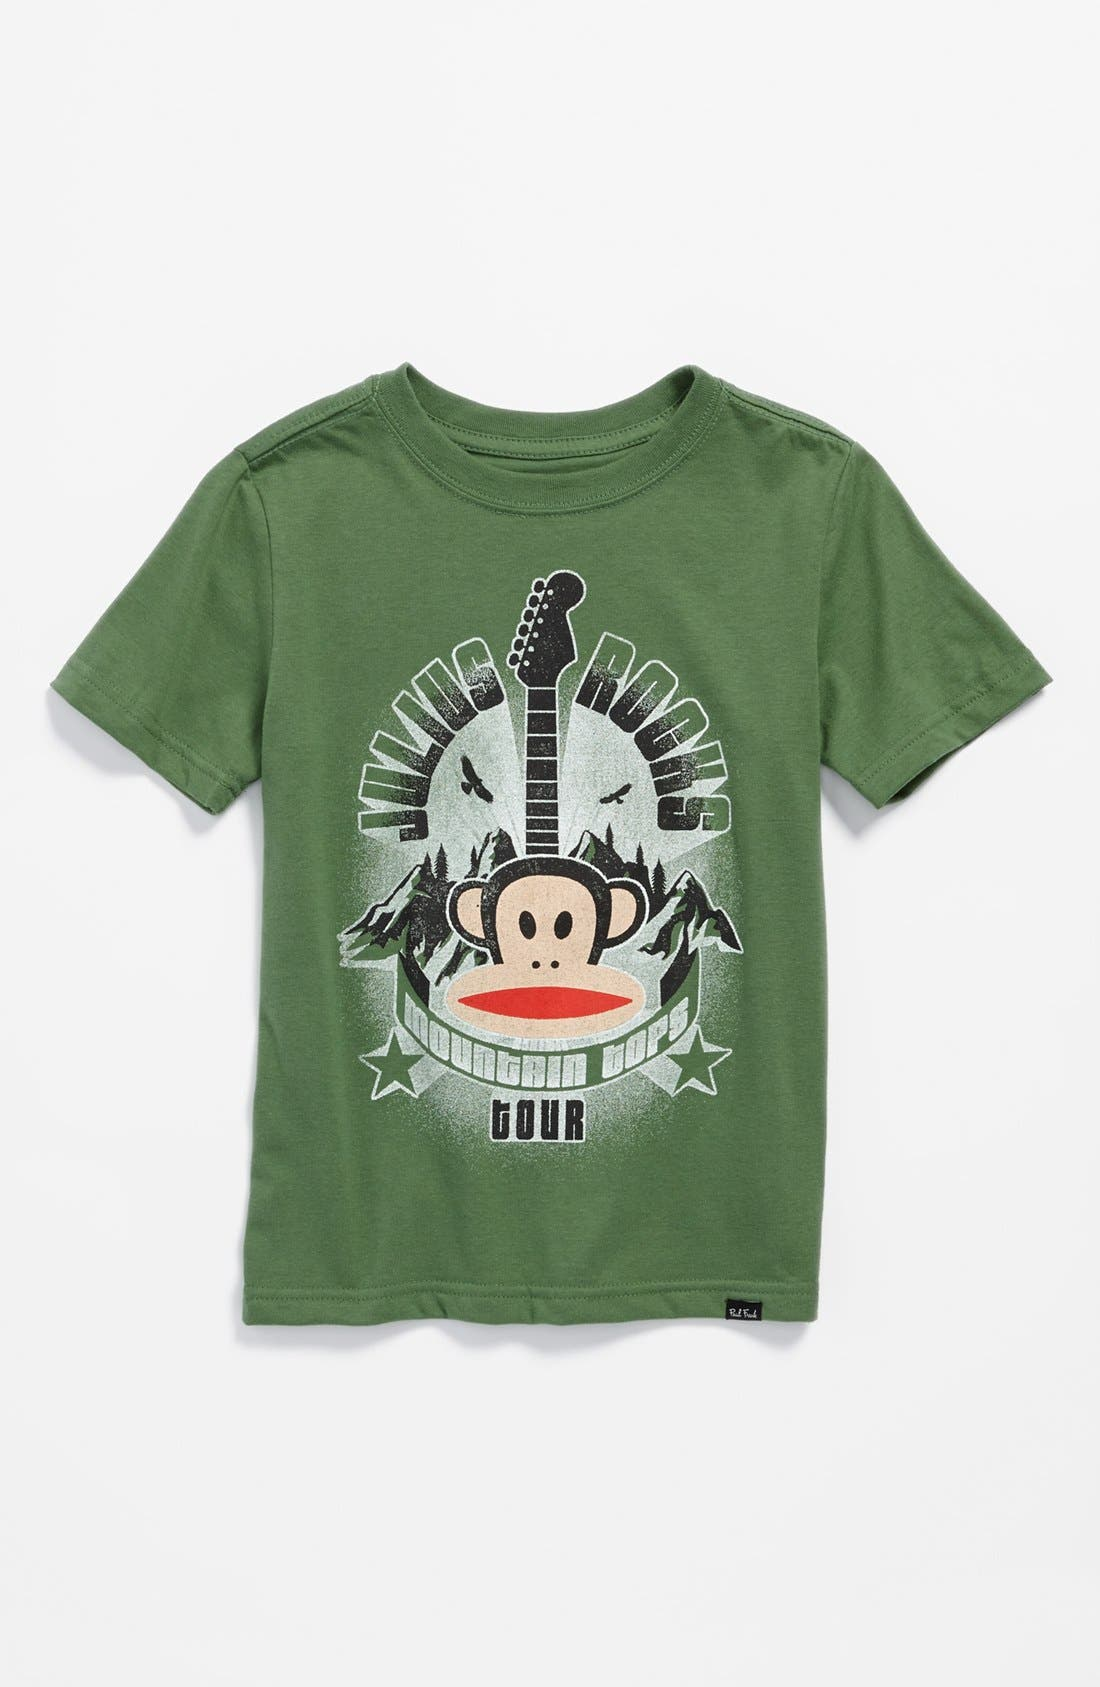 Alternate Image 1 Selected - Paul Frank 'Julius® Rocks' T-Shirt (Little Boys)